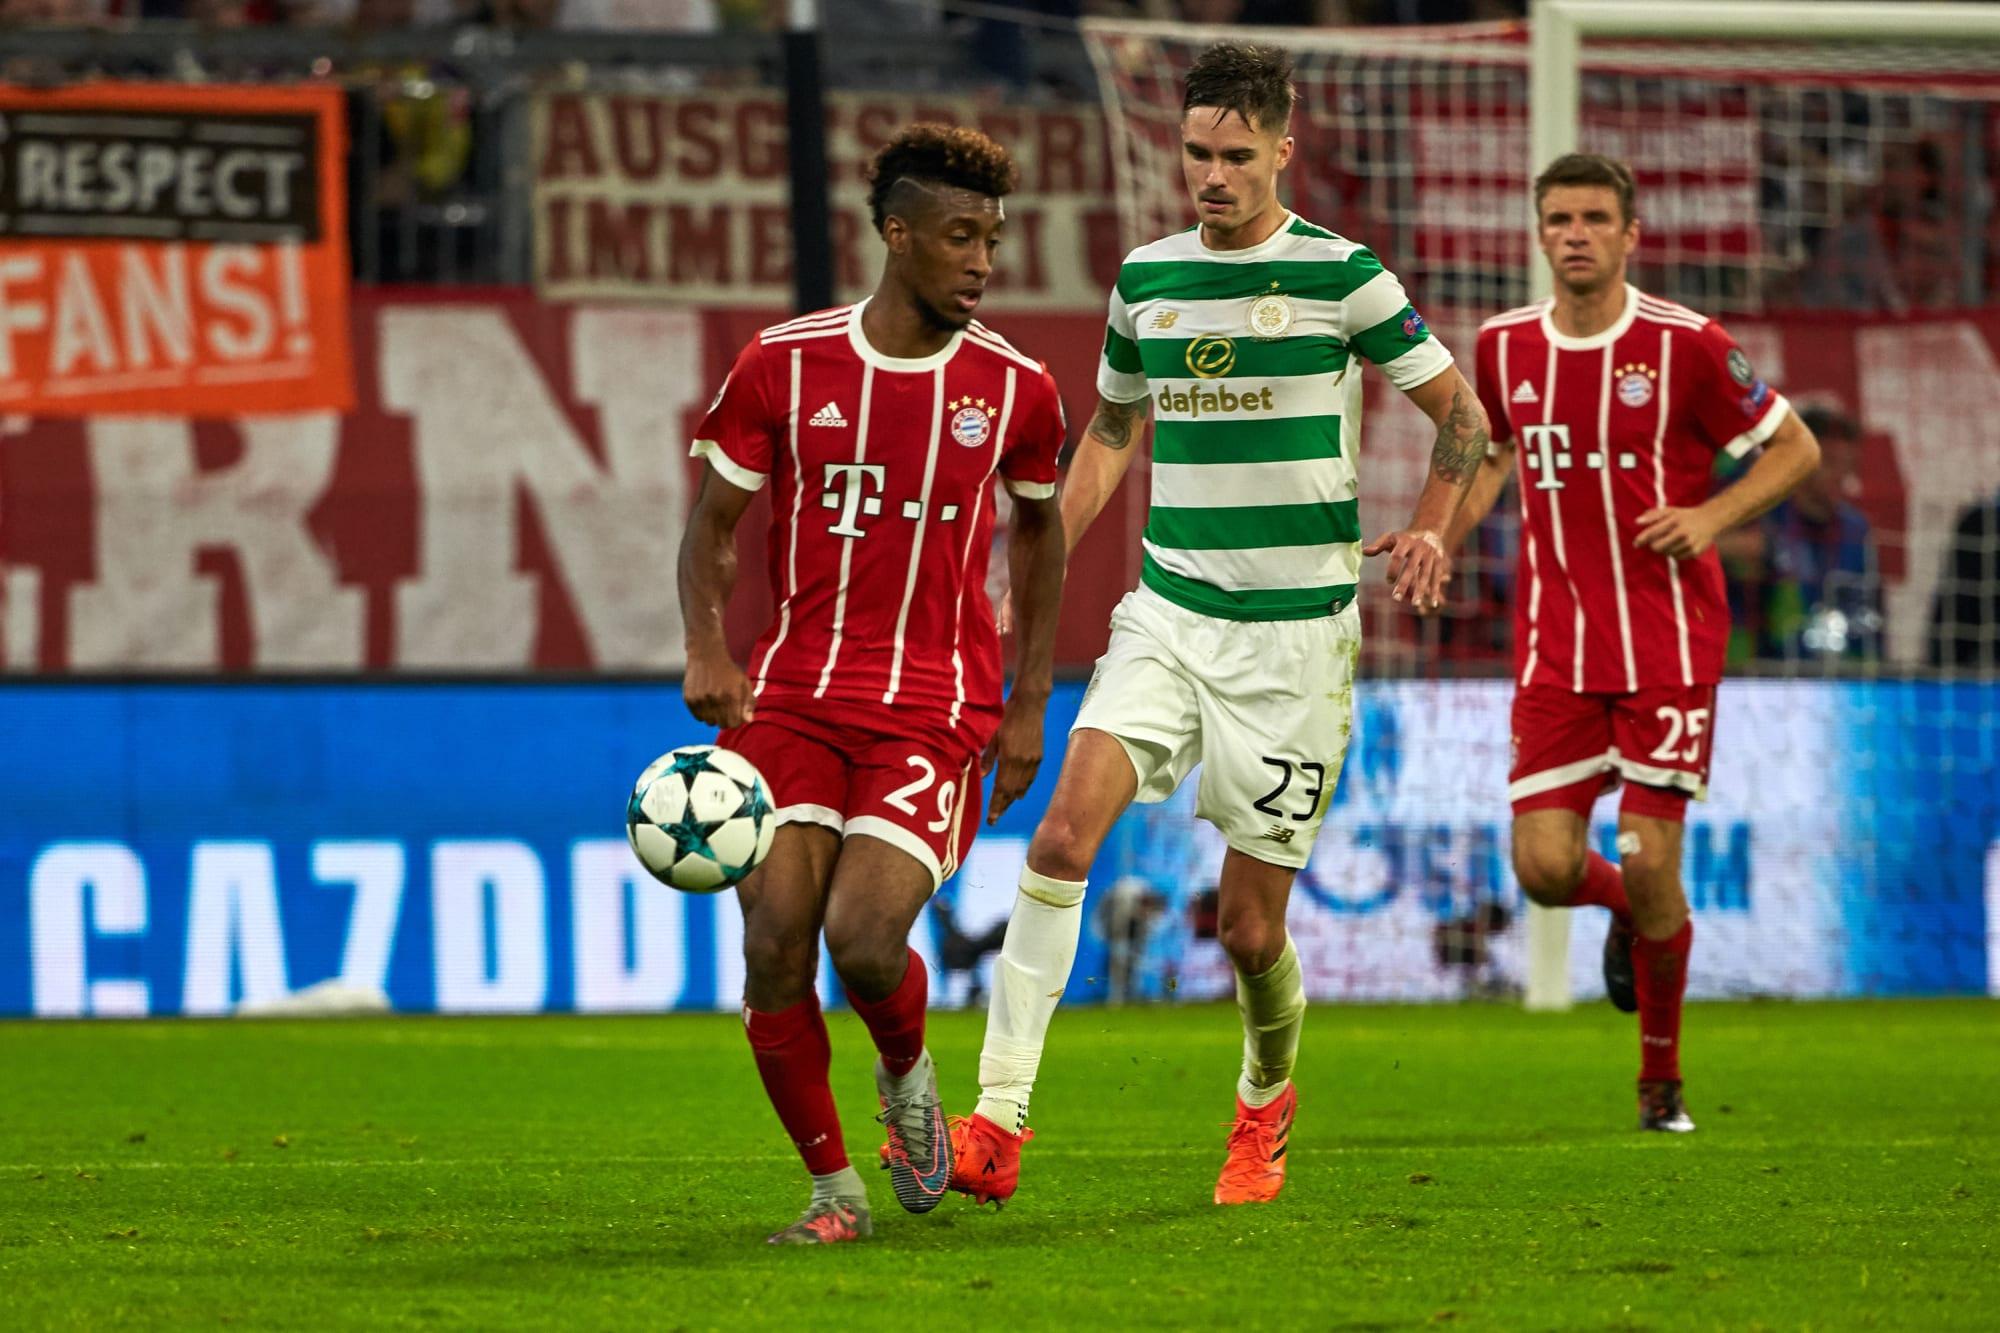 Borussia Dortmund vs. Bayern Munich live stream: Watch